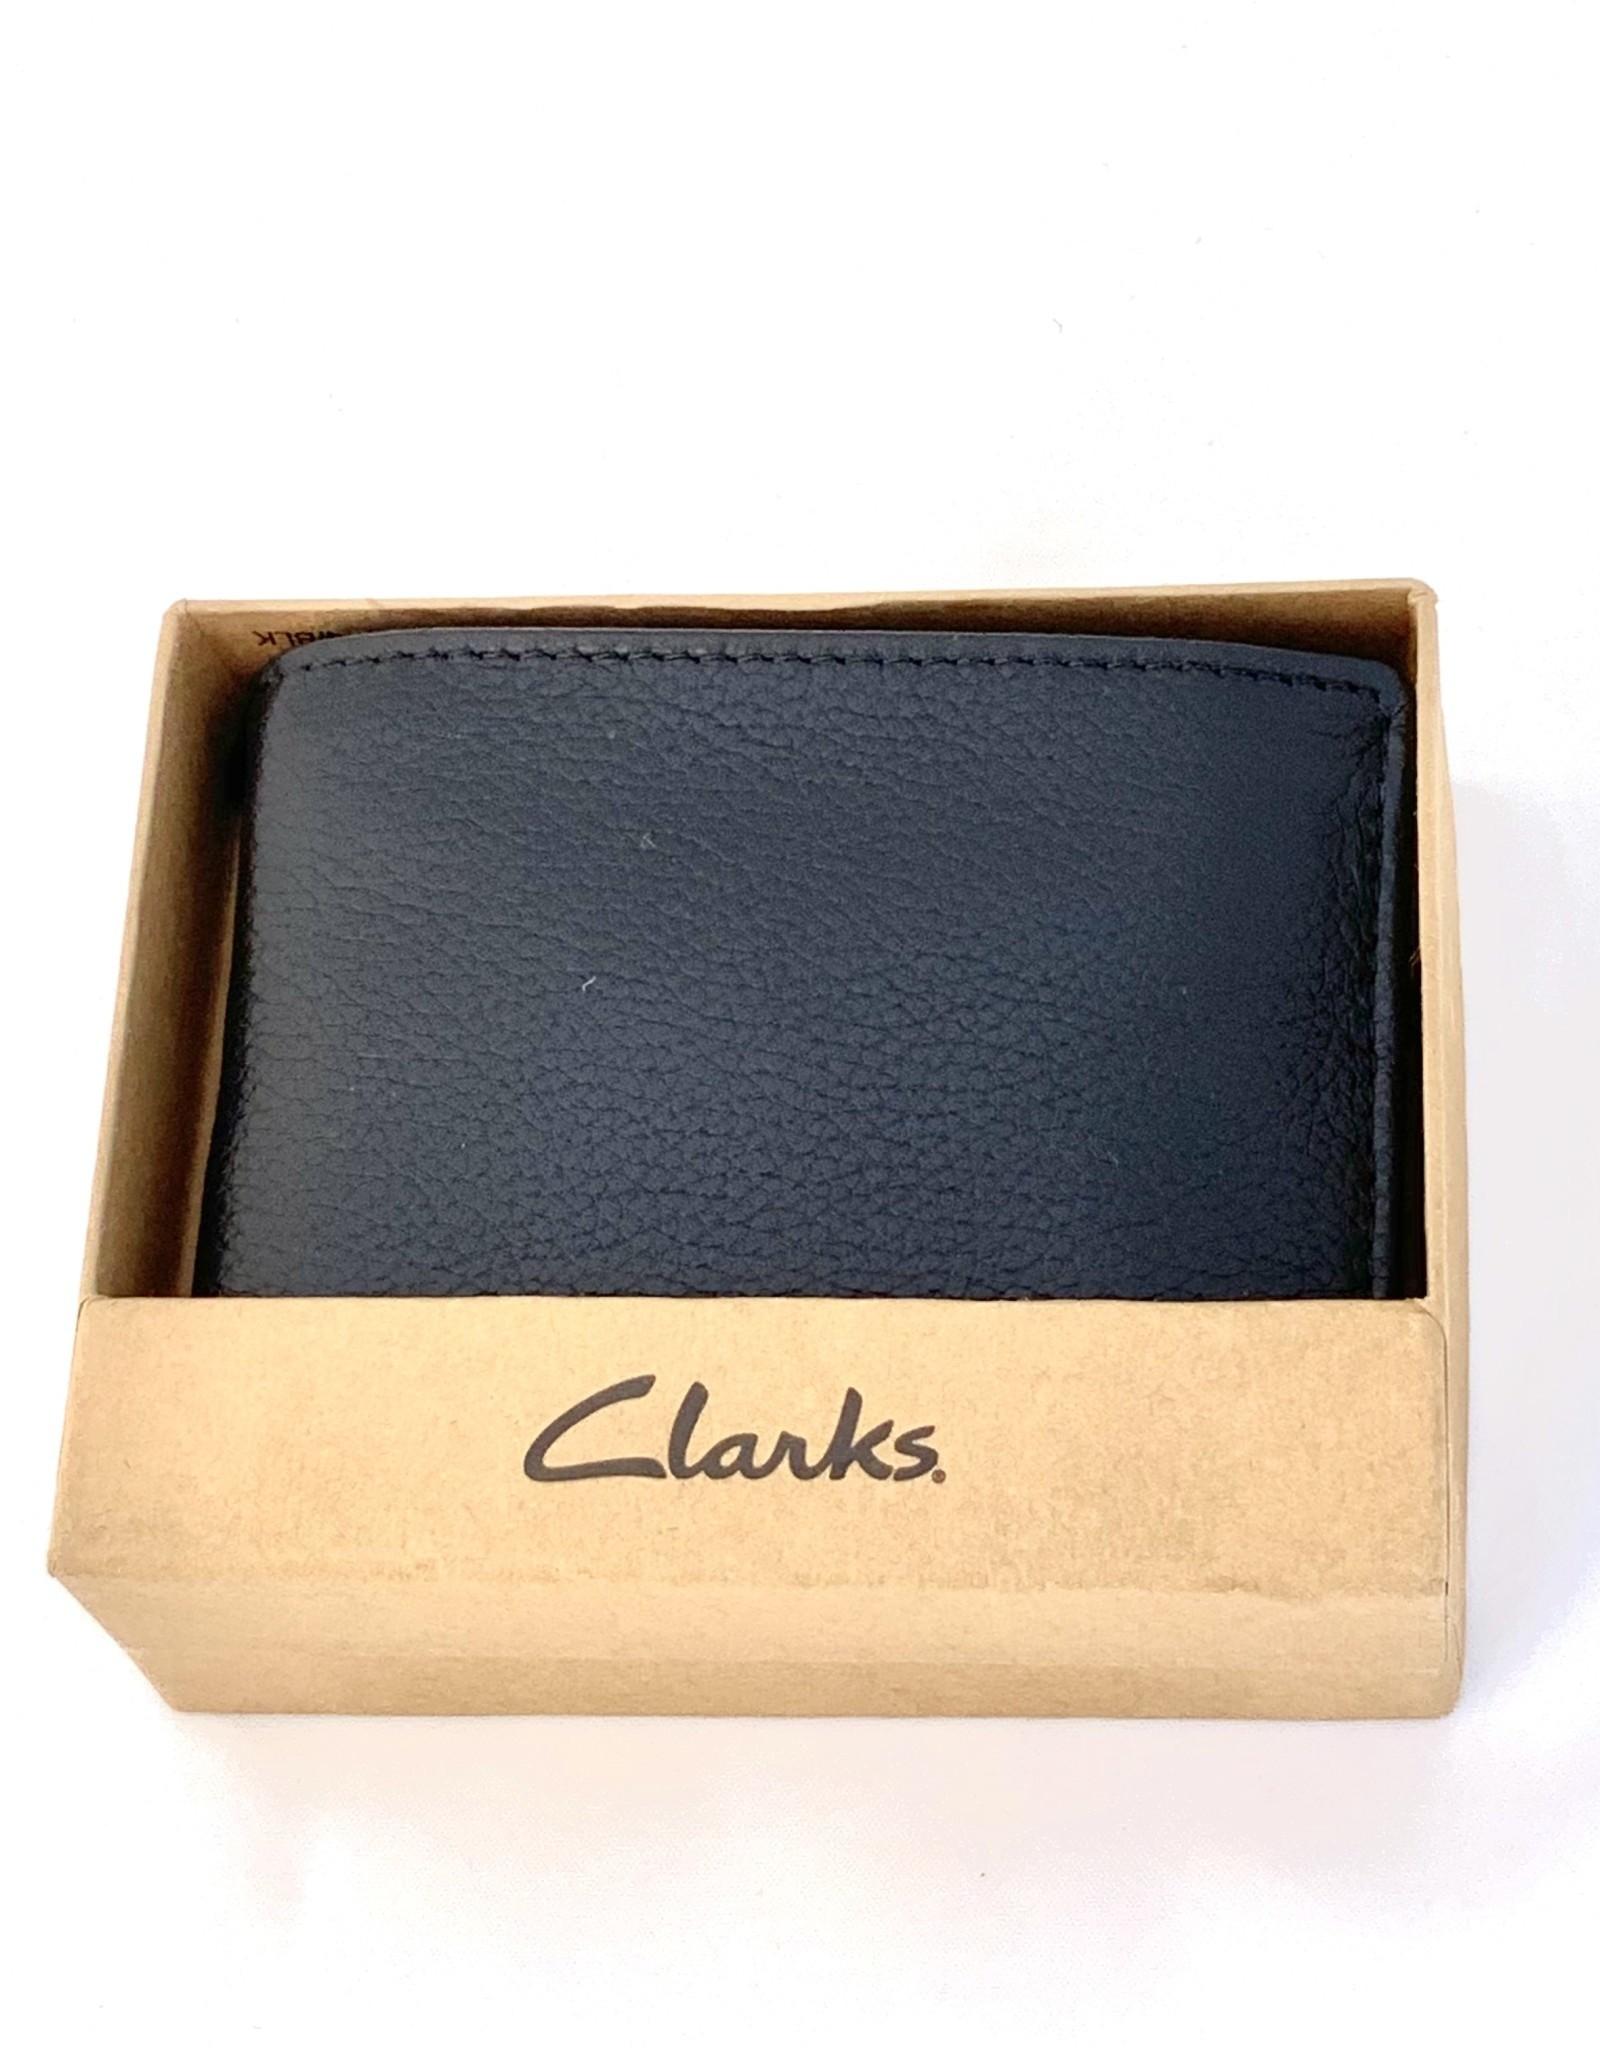 Clarks Clarks Billfold